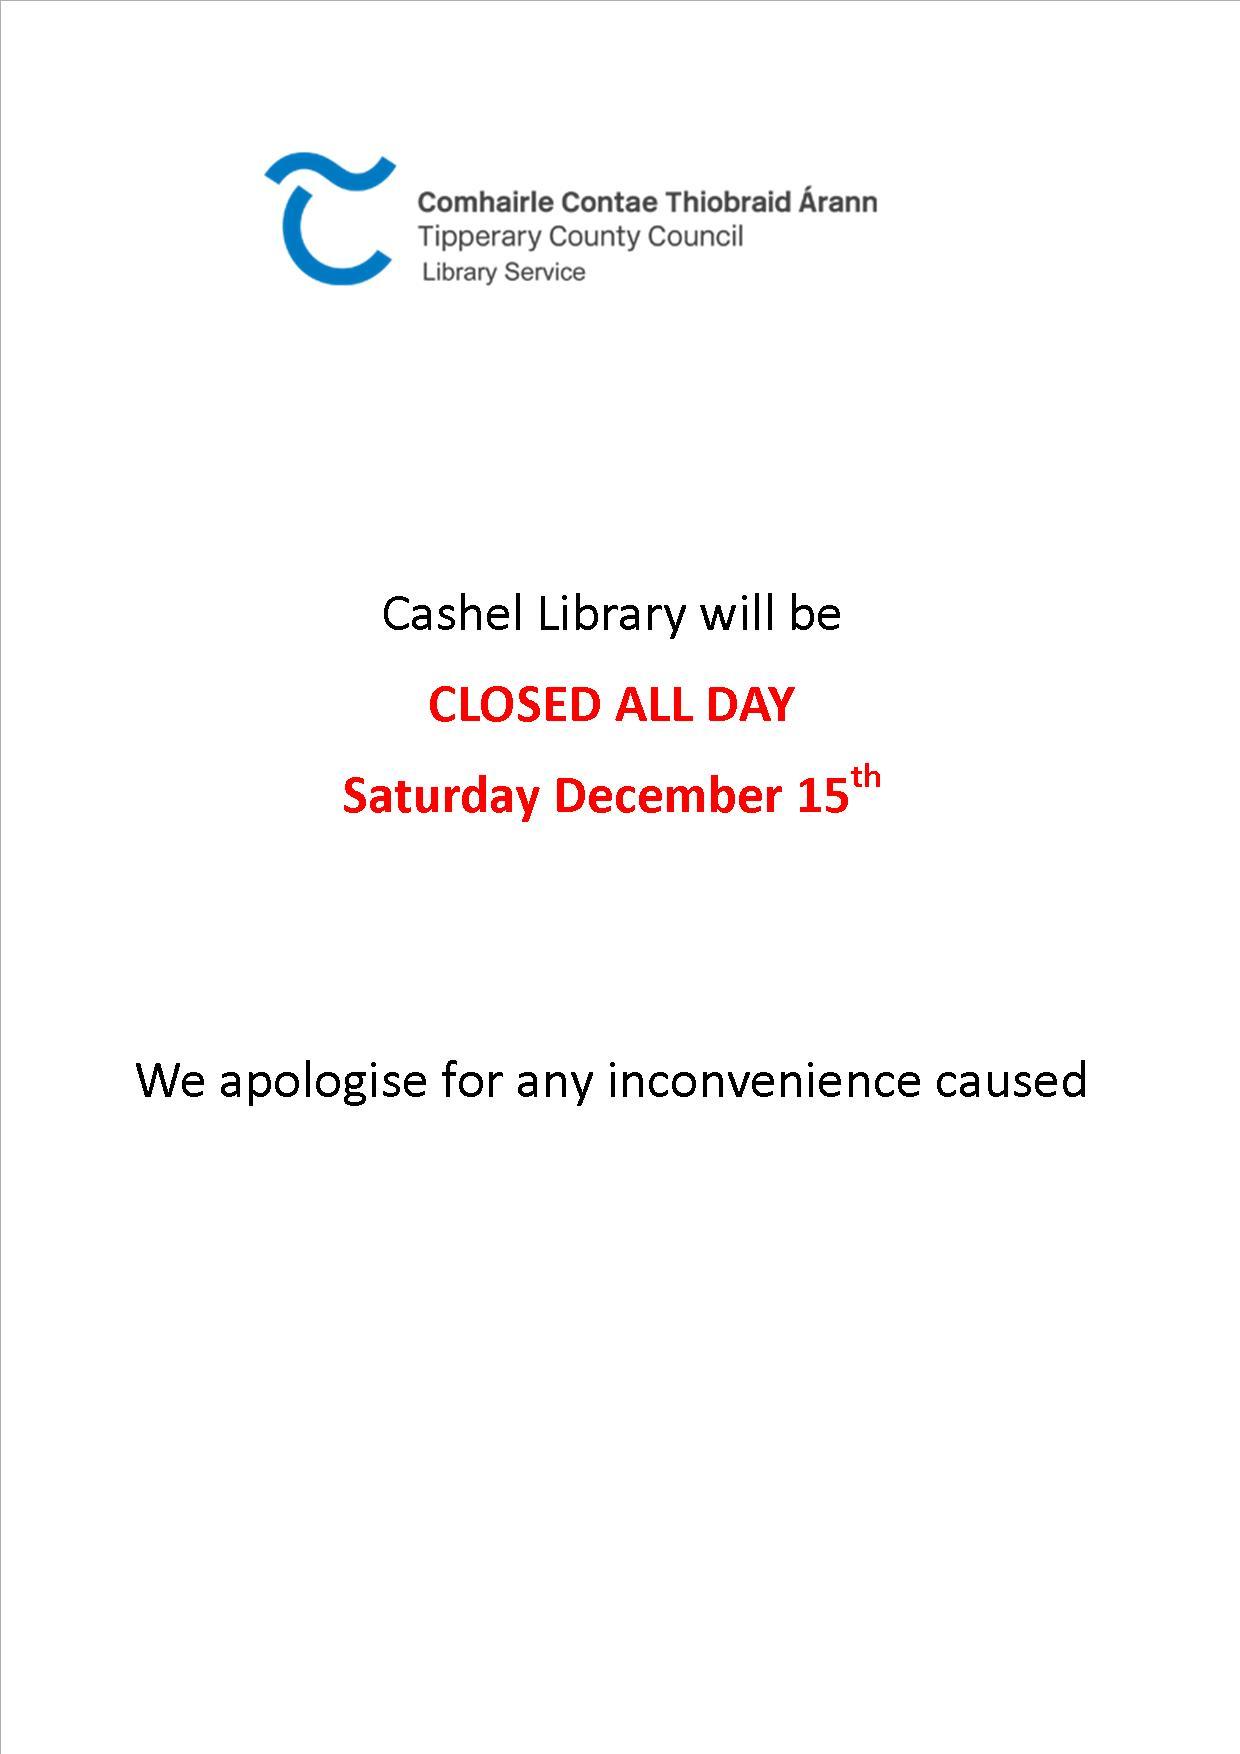 Cashel: Closed Saturday December 15th